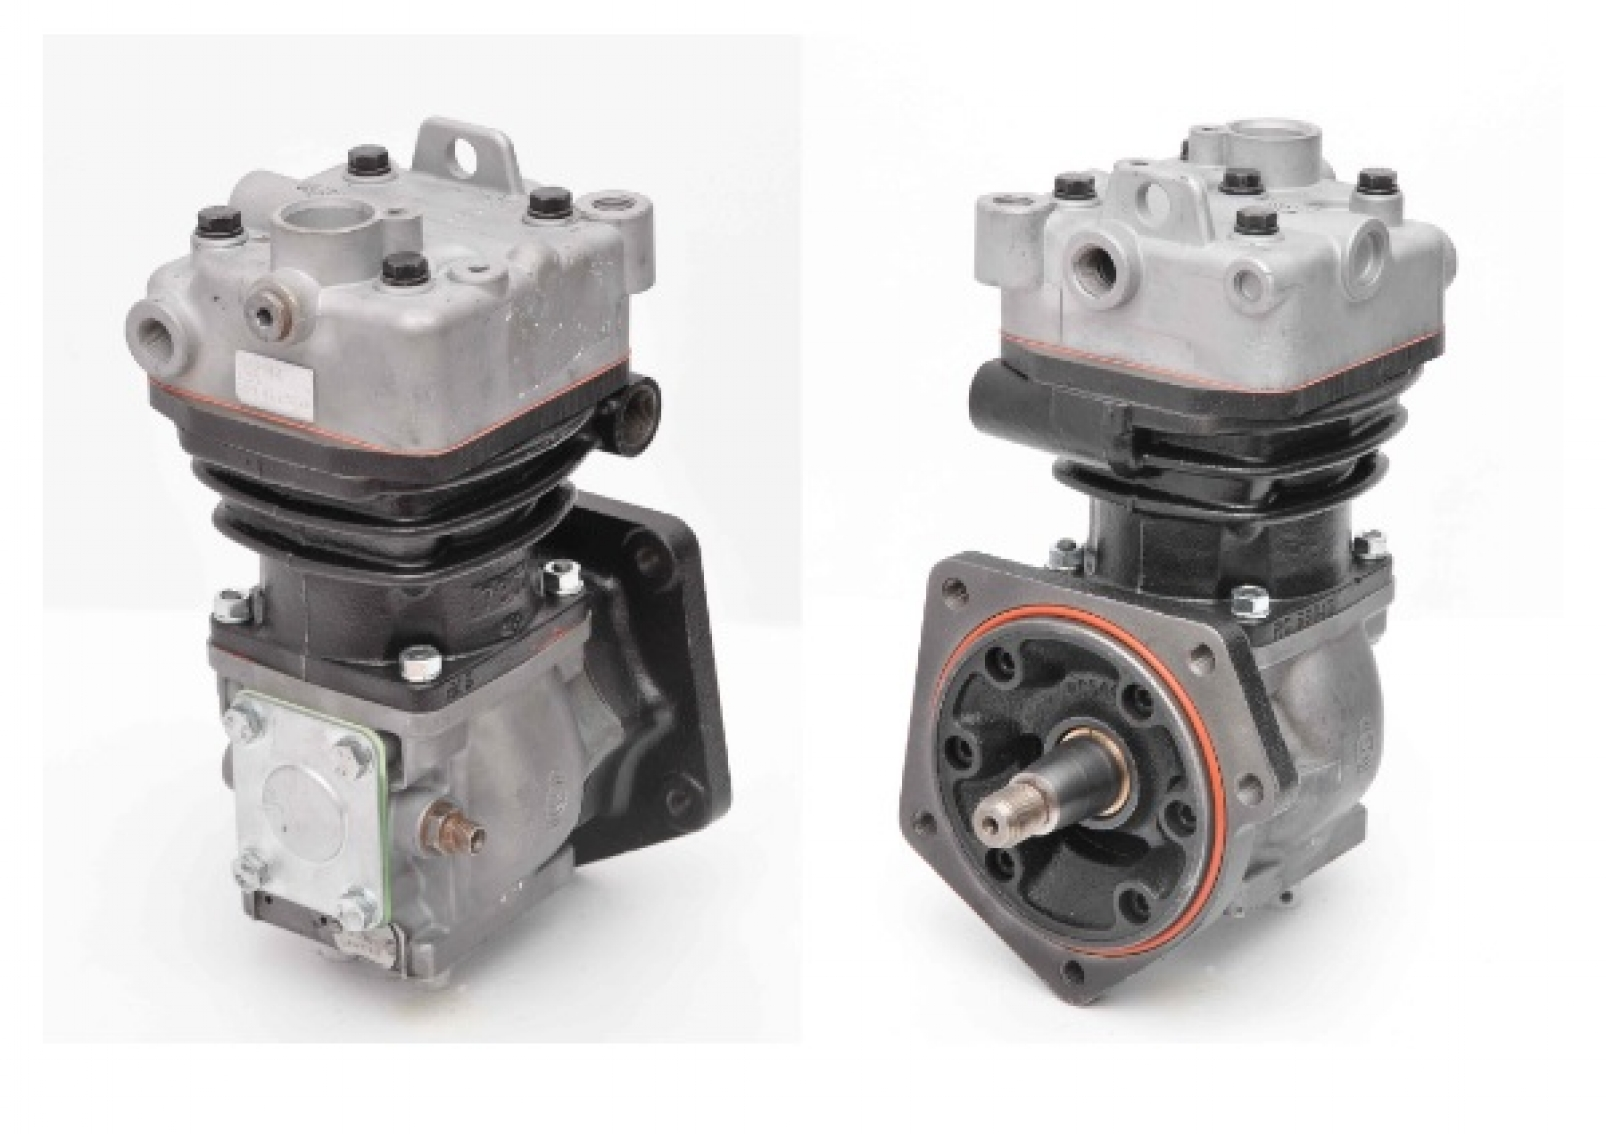 Air Compressor for Volvo, LK3930, 1628592, 8112583, II18606000, LK3982, 3987601, 85000063